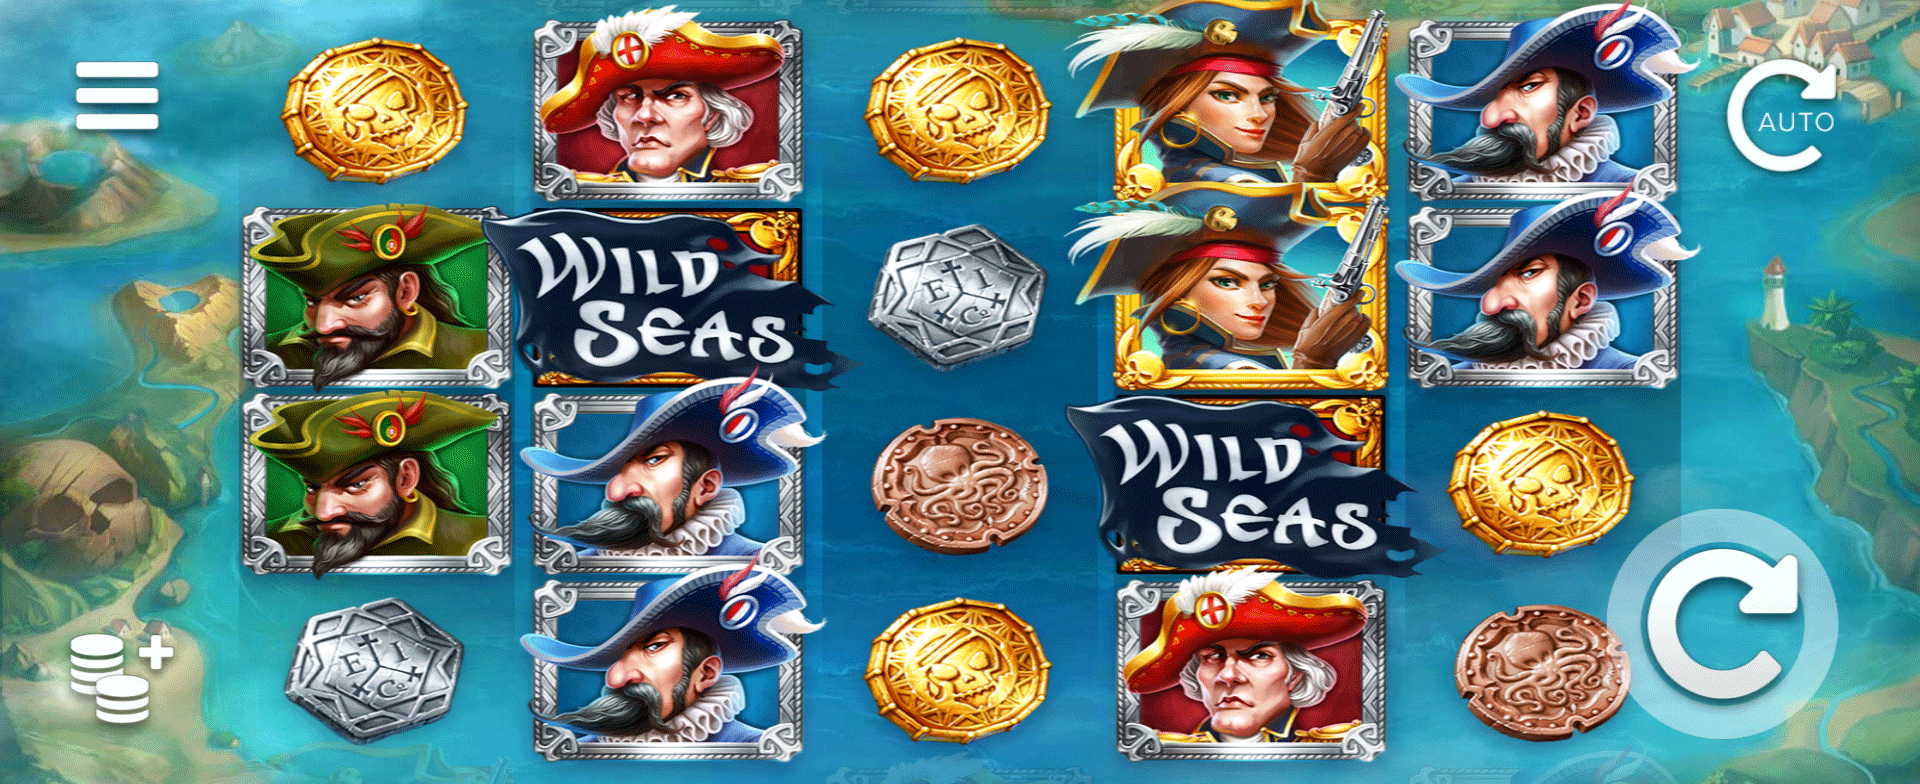 Slot Wild Seas